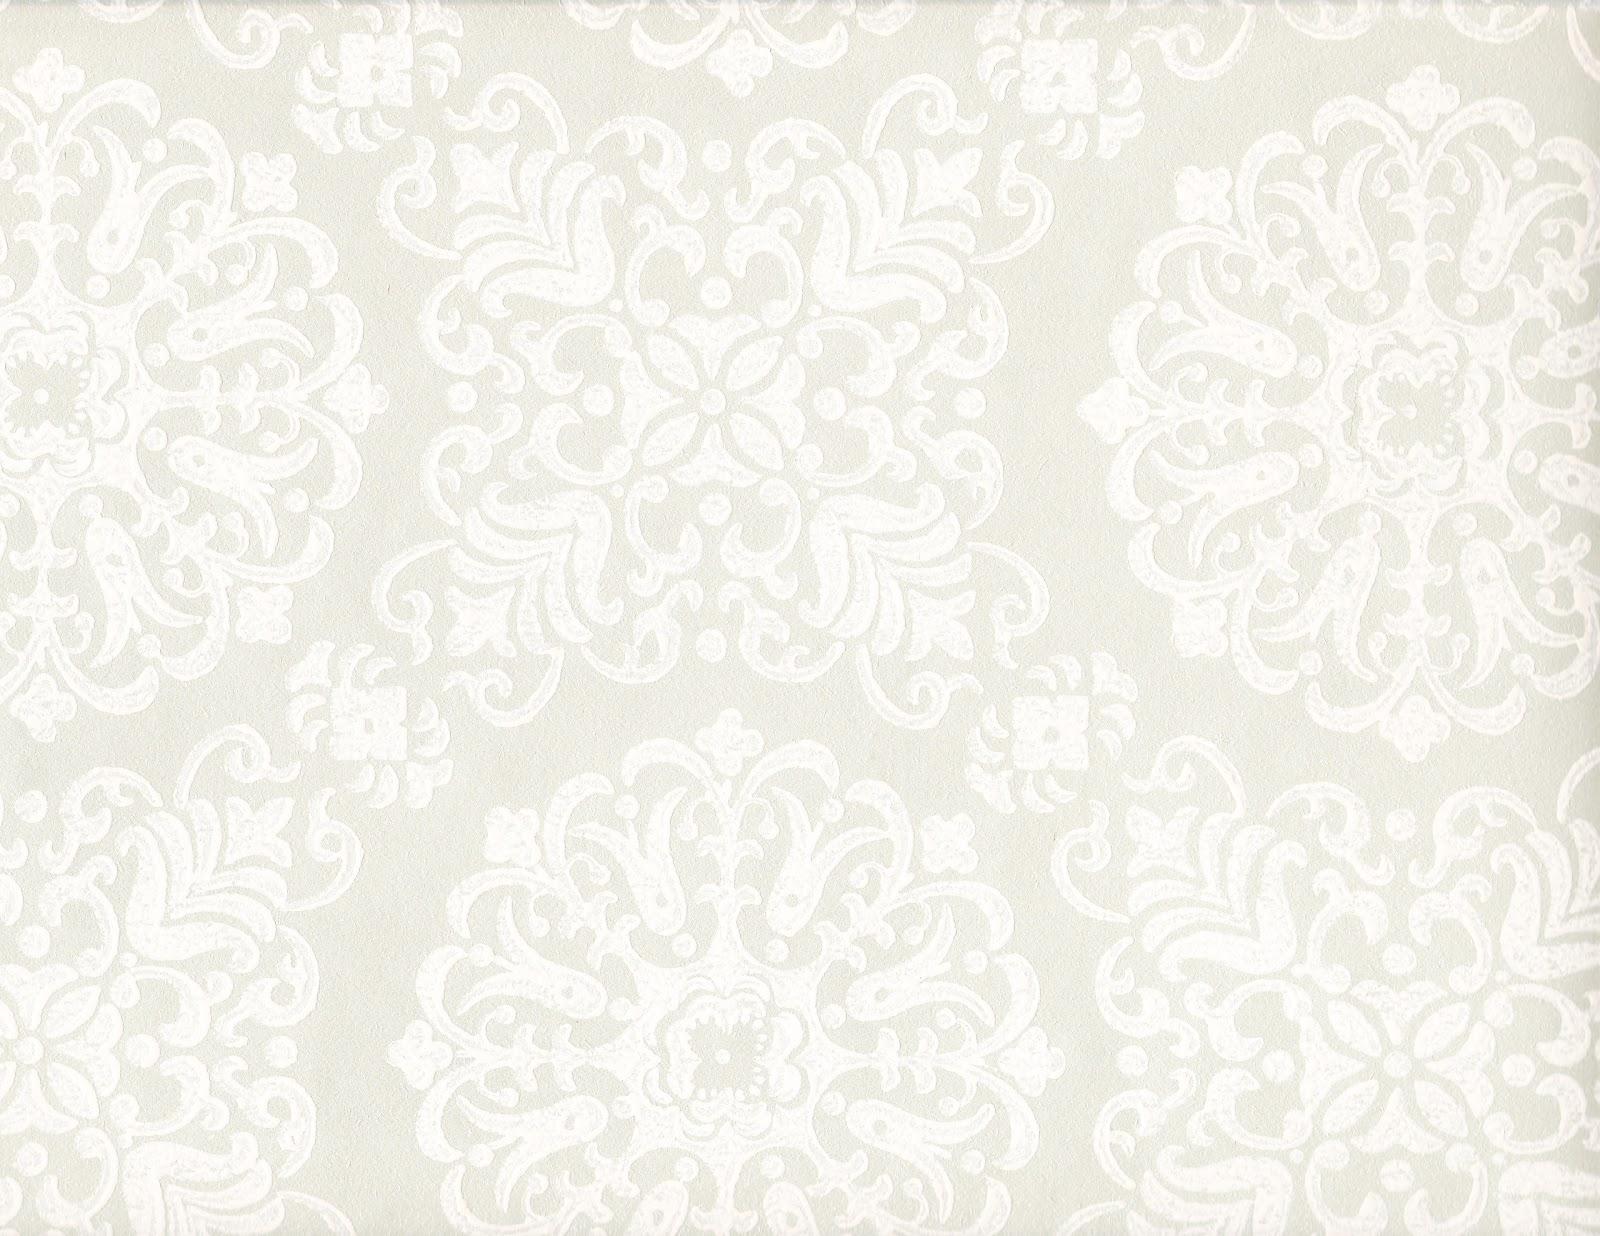 Simple Vintage Wallpaper Backgrounds